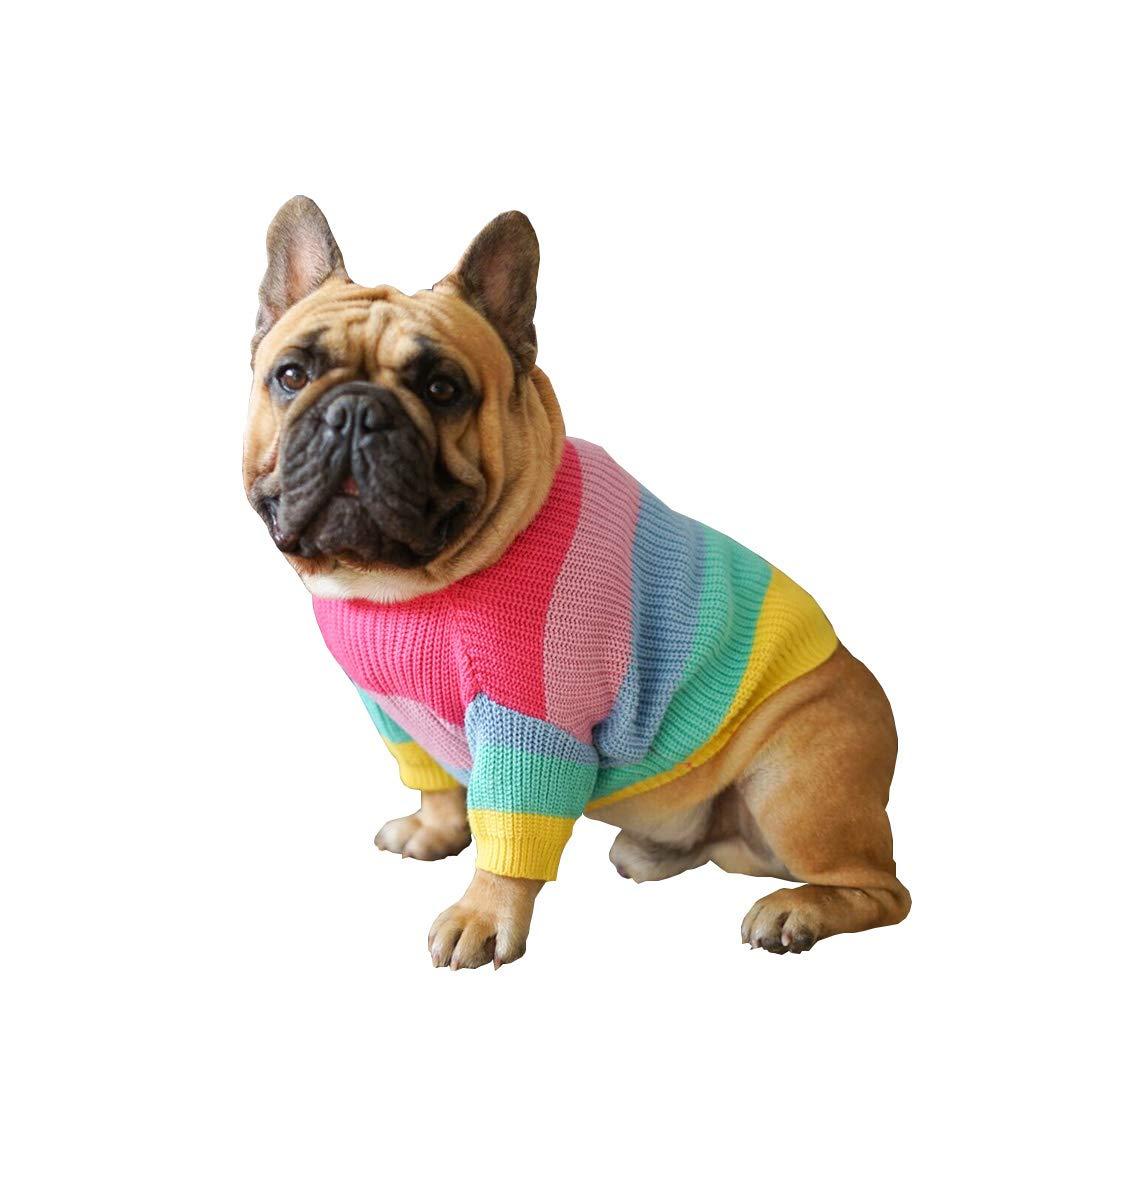 Khemn Bulldog Rainbow Knitted Sweater, Dog Pullover, Cute Dog Clothes for French Bulldog/English Bulldog/Bull Terrier/Pug (XL) by Khemn